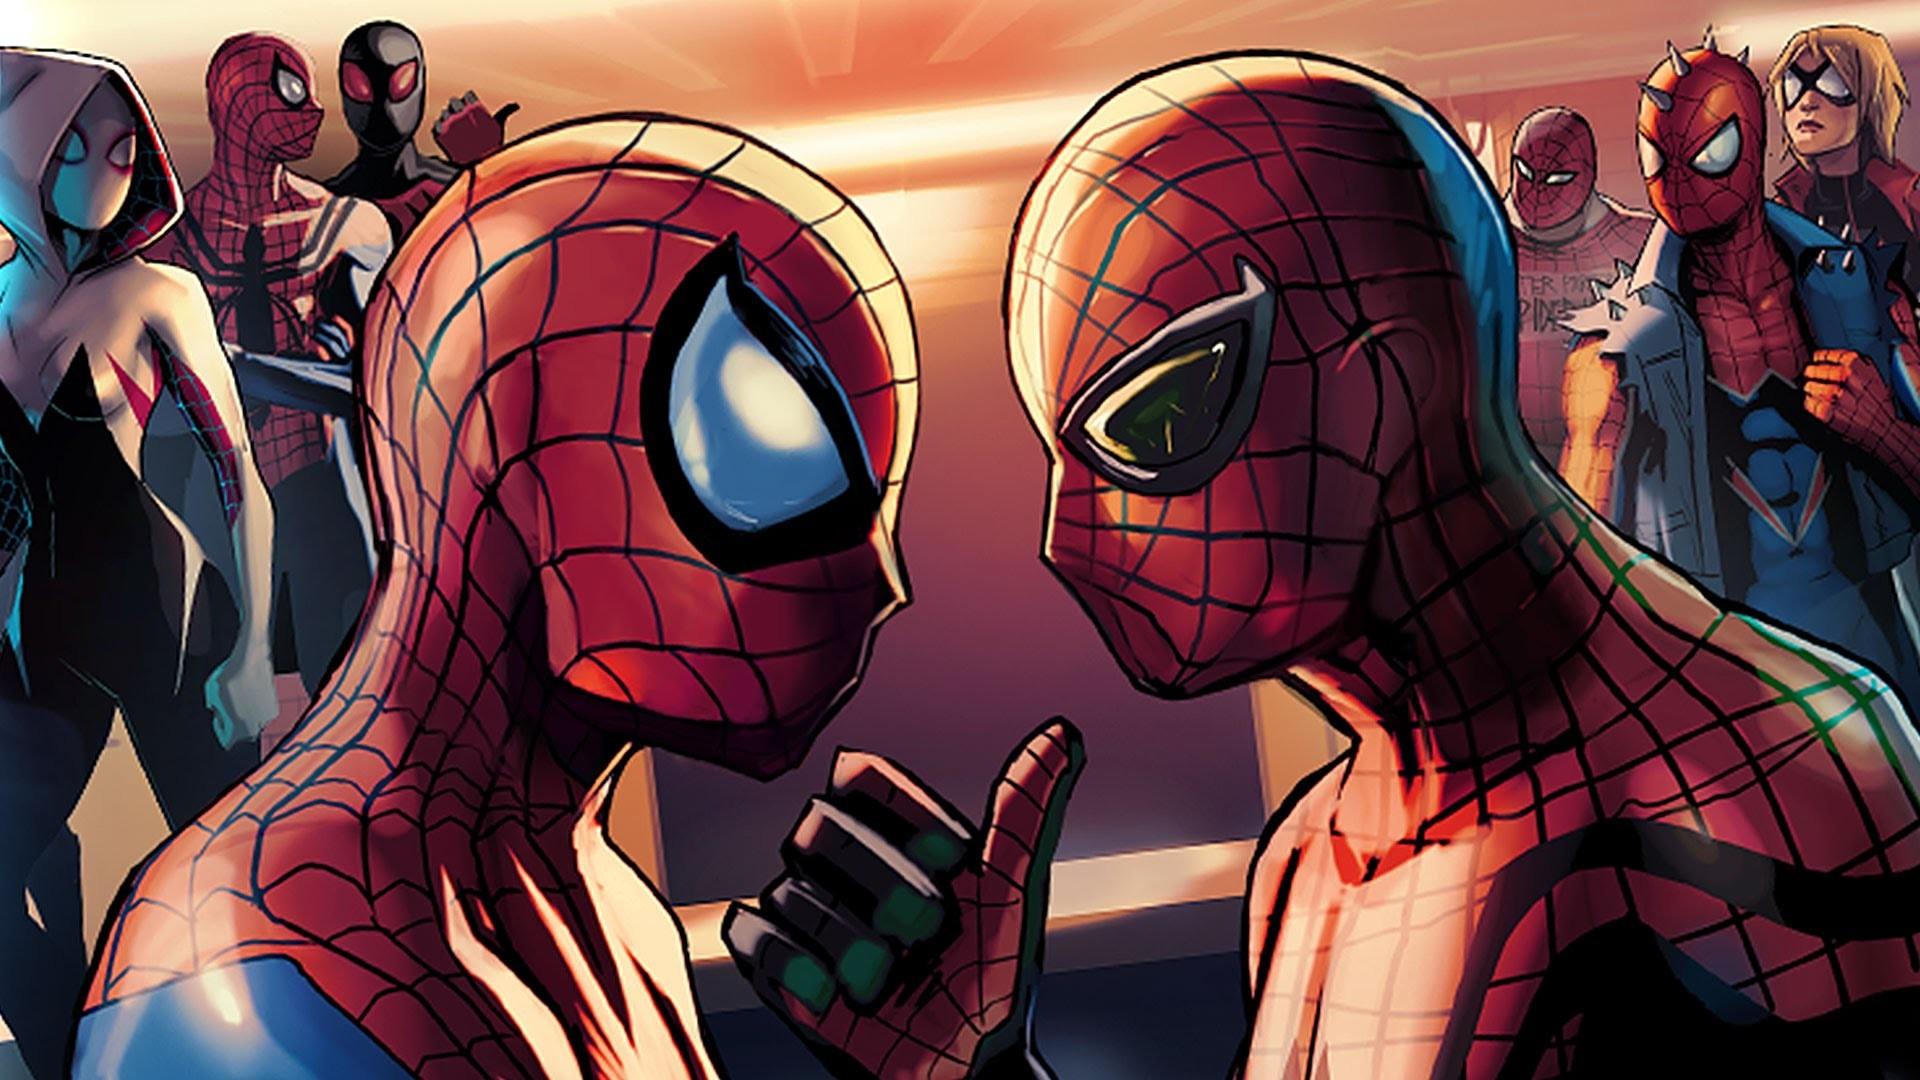 Superior Spiderman Wallpaper HD 74 images 1920x1080